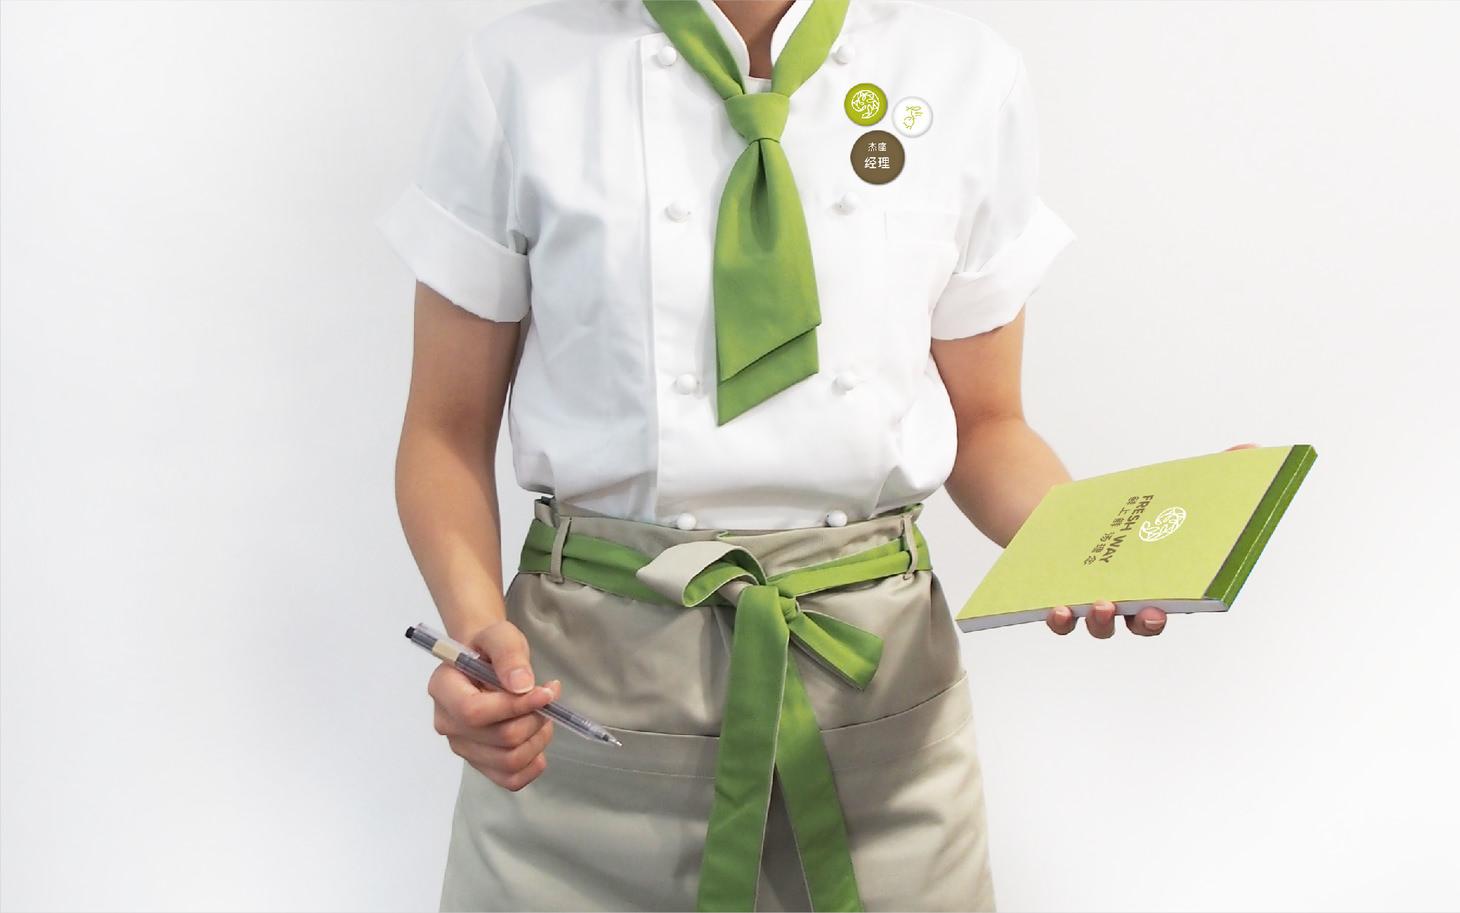 FreshWay_Uniform_01.jpg